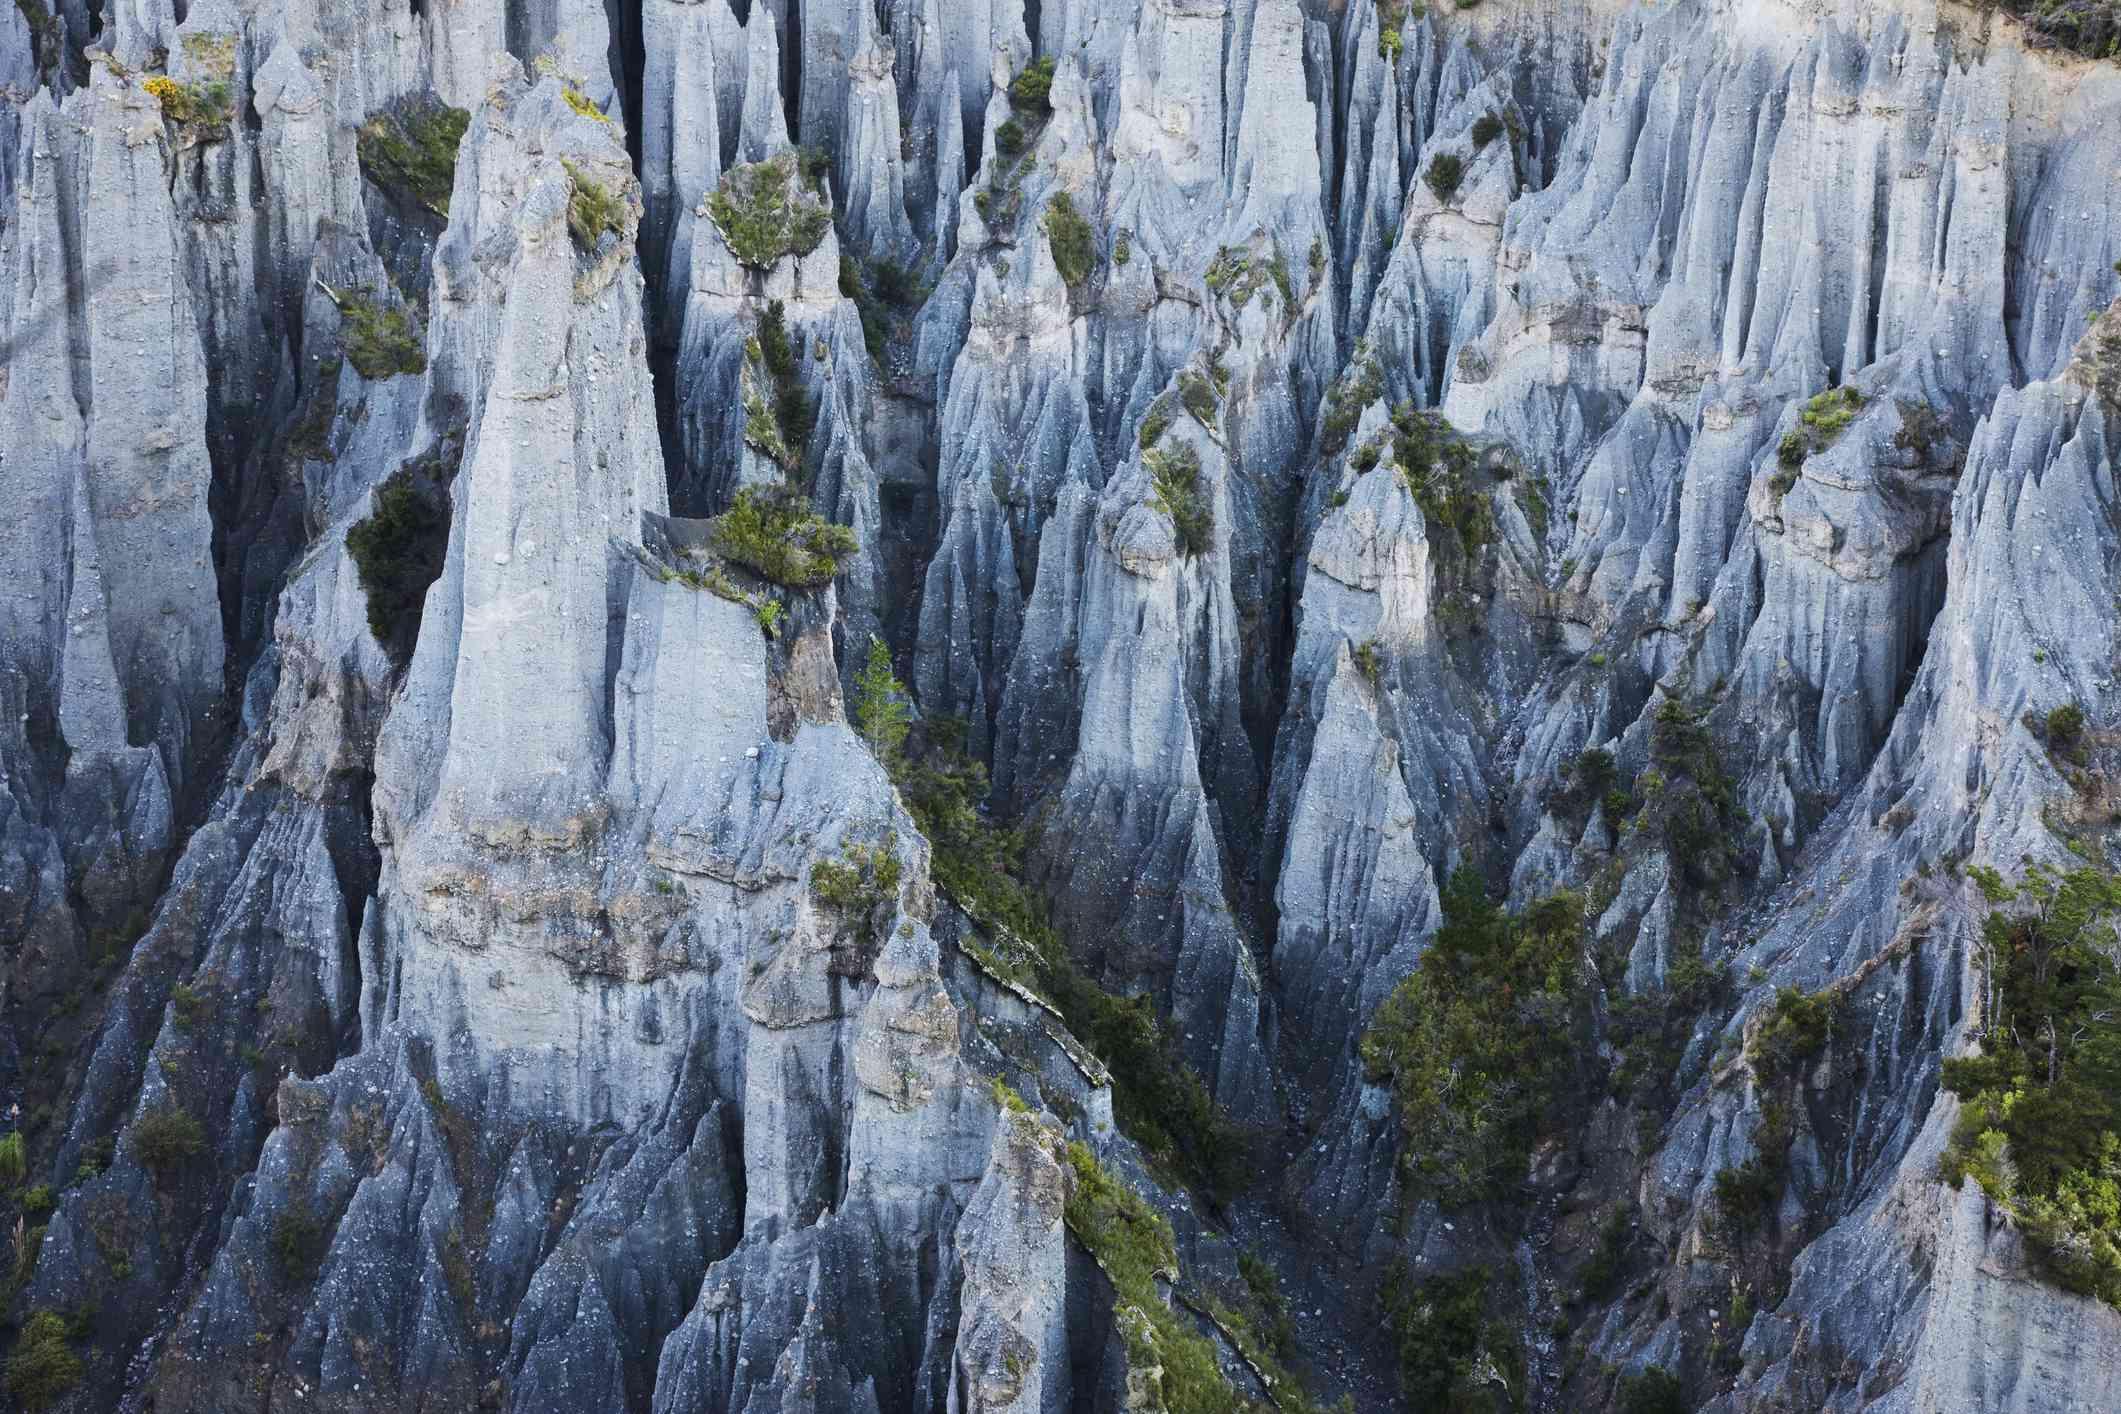 rocks of Putangirua Pinnacles